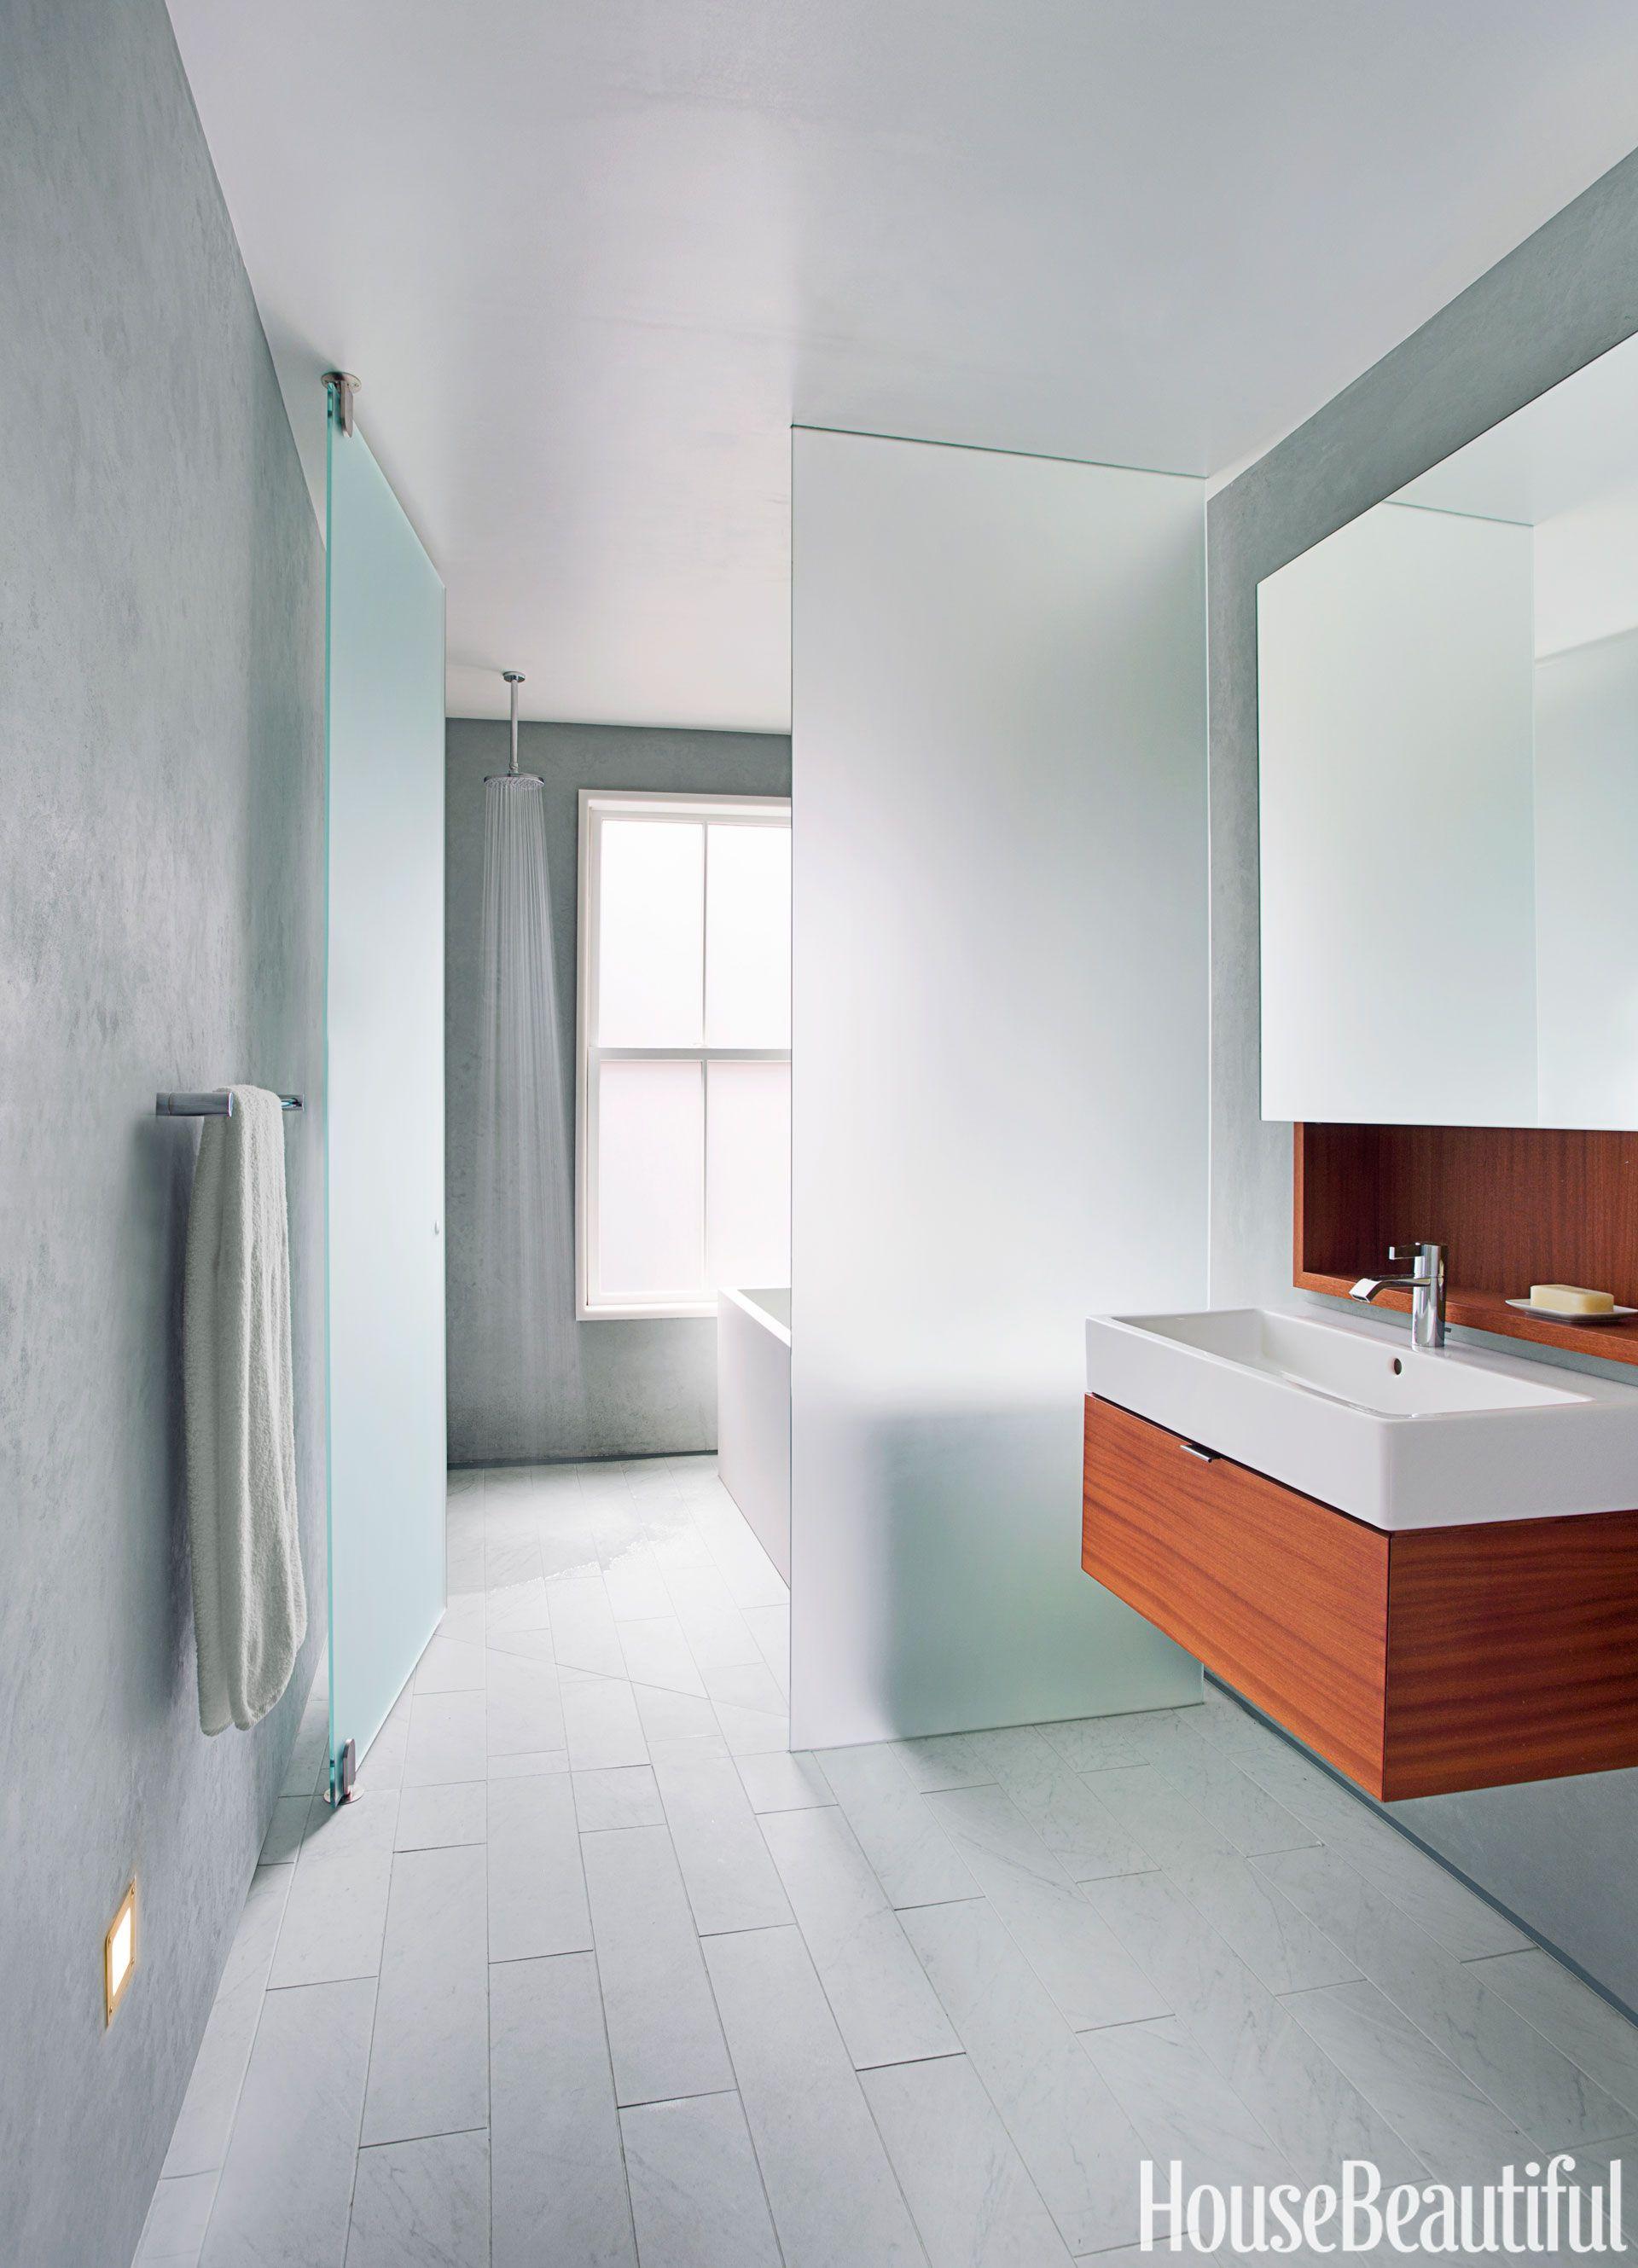 Entspannendes badezimmerdekor a modern and ethereal bathroom  baños  pinterest  badezimmer bad